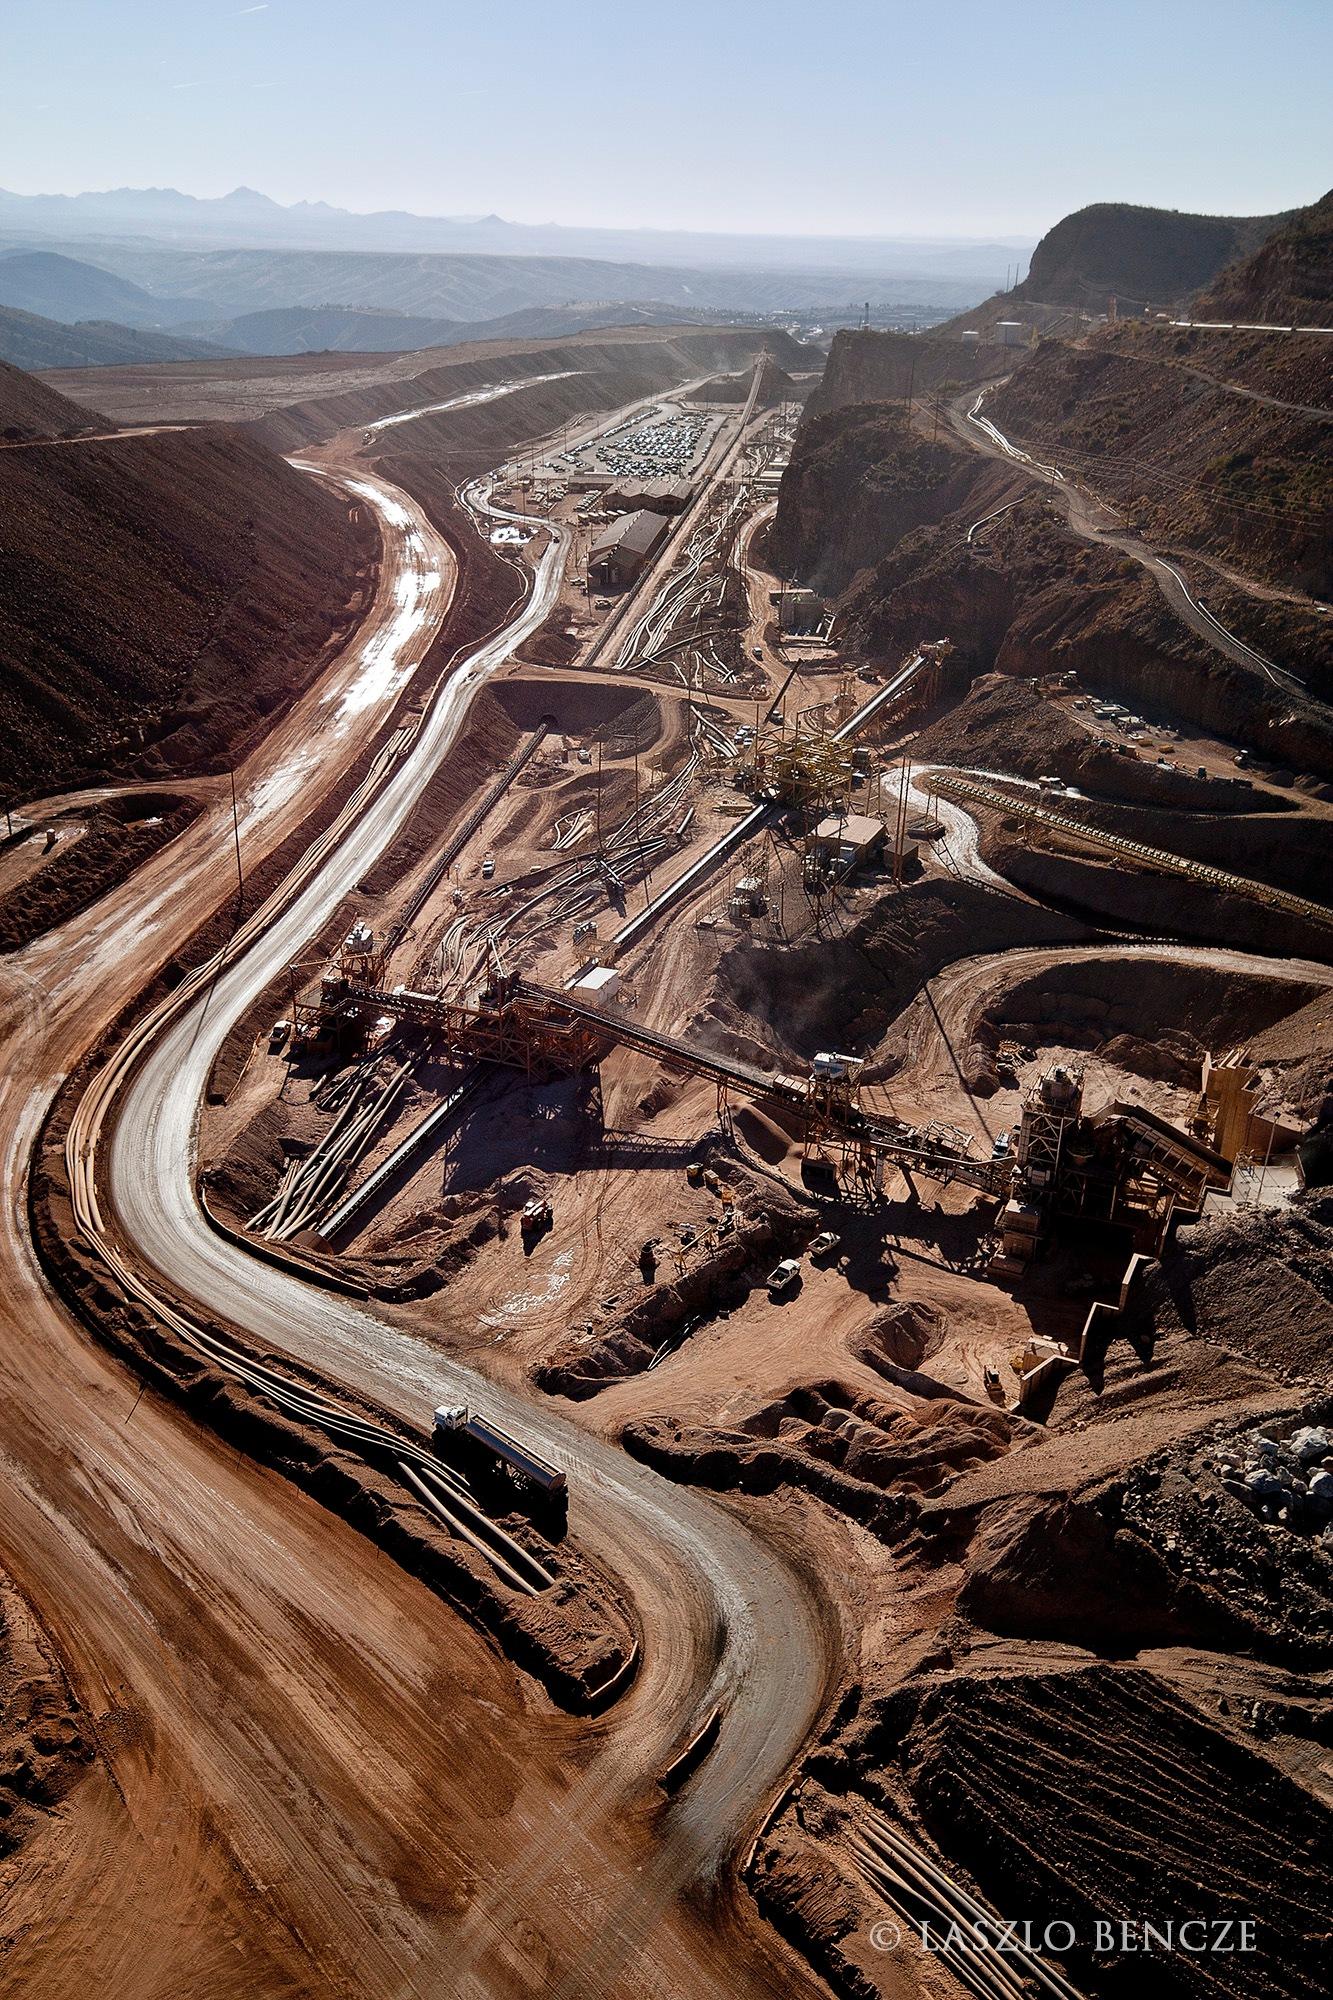 Mine Activity, Arizona by Laszlo Bencze